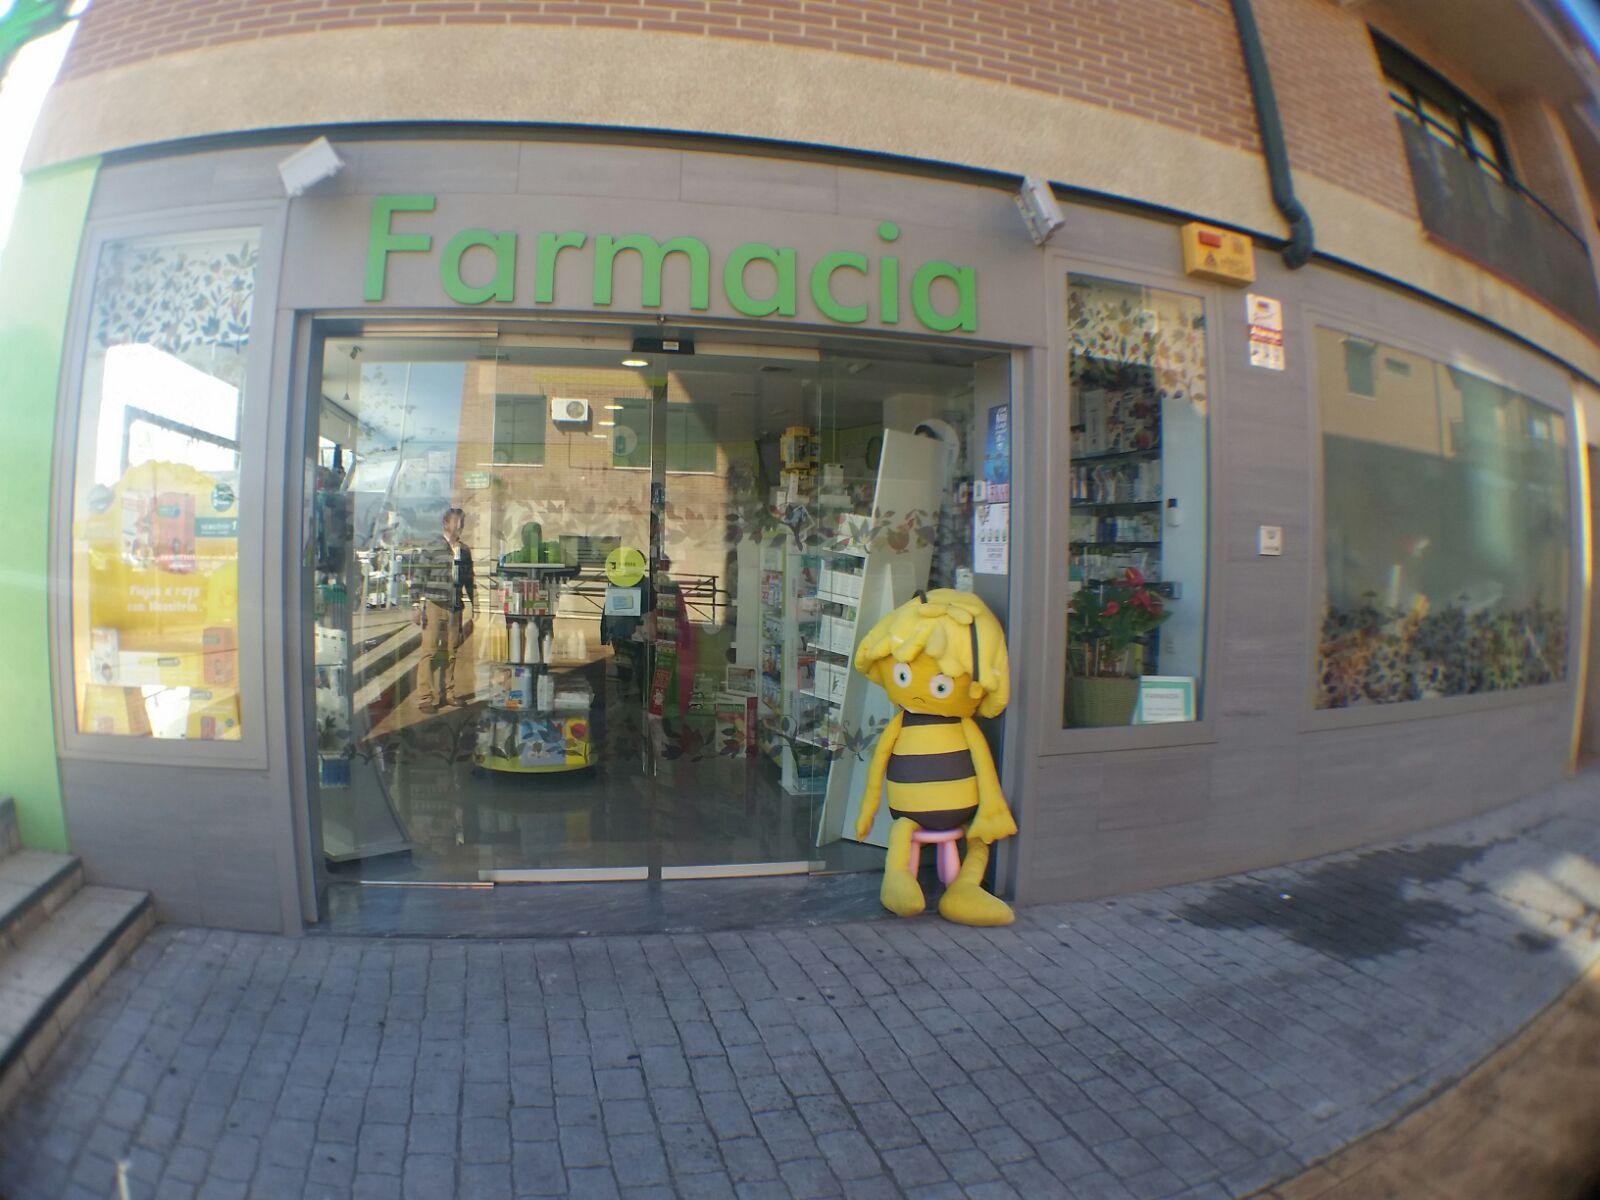 FARMACIA Mª DOLORES CANDELA CEPEDA: FARMACIA EN CÁCERES, PARAFARMACIA EN CÁCERES,